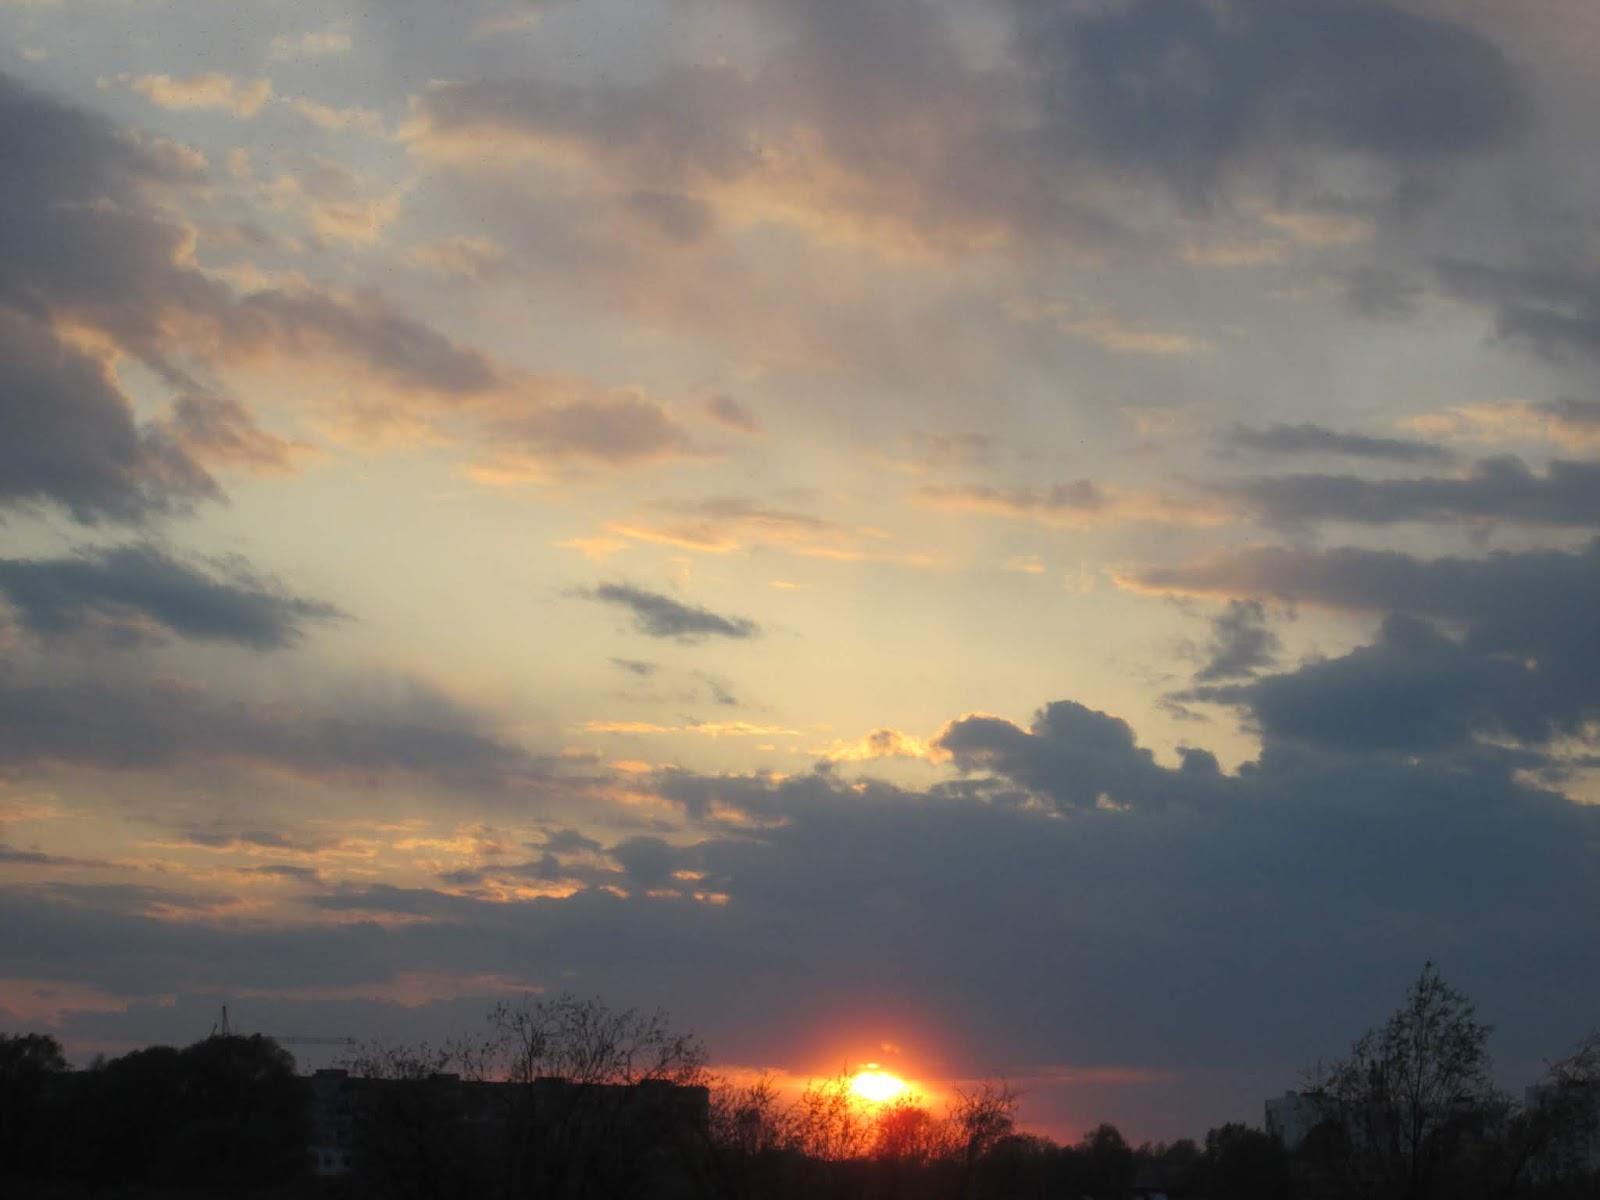 Закат красного солнца над рекой